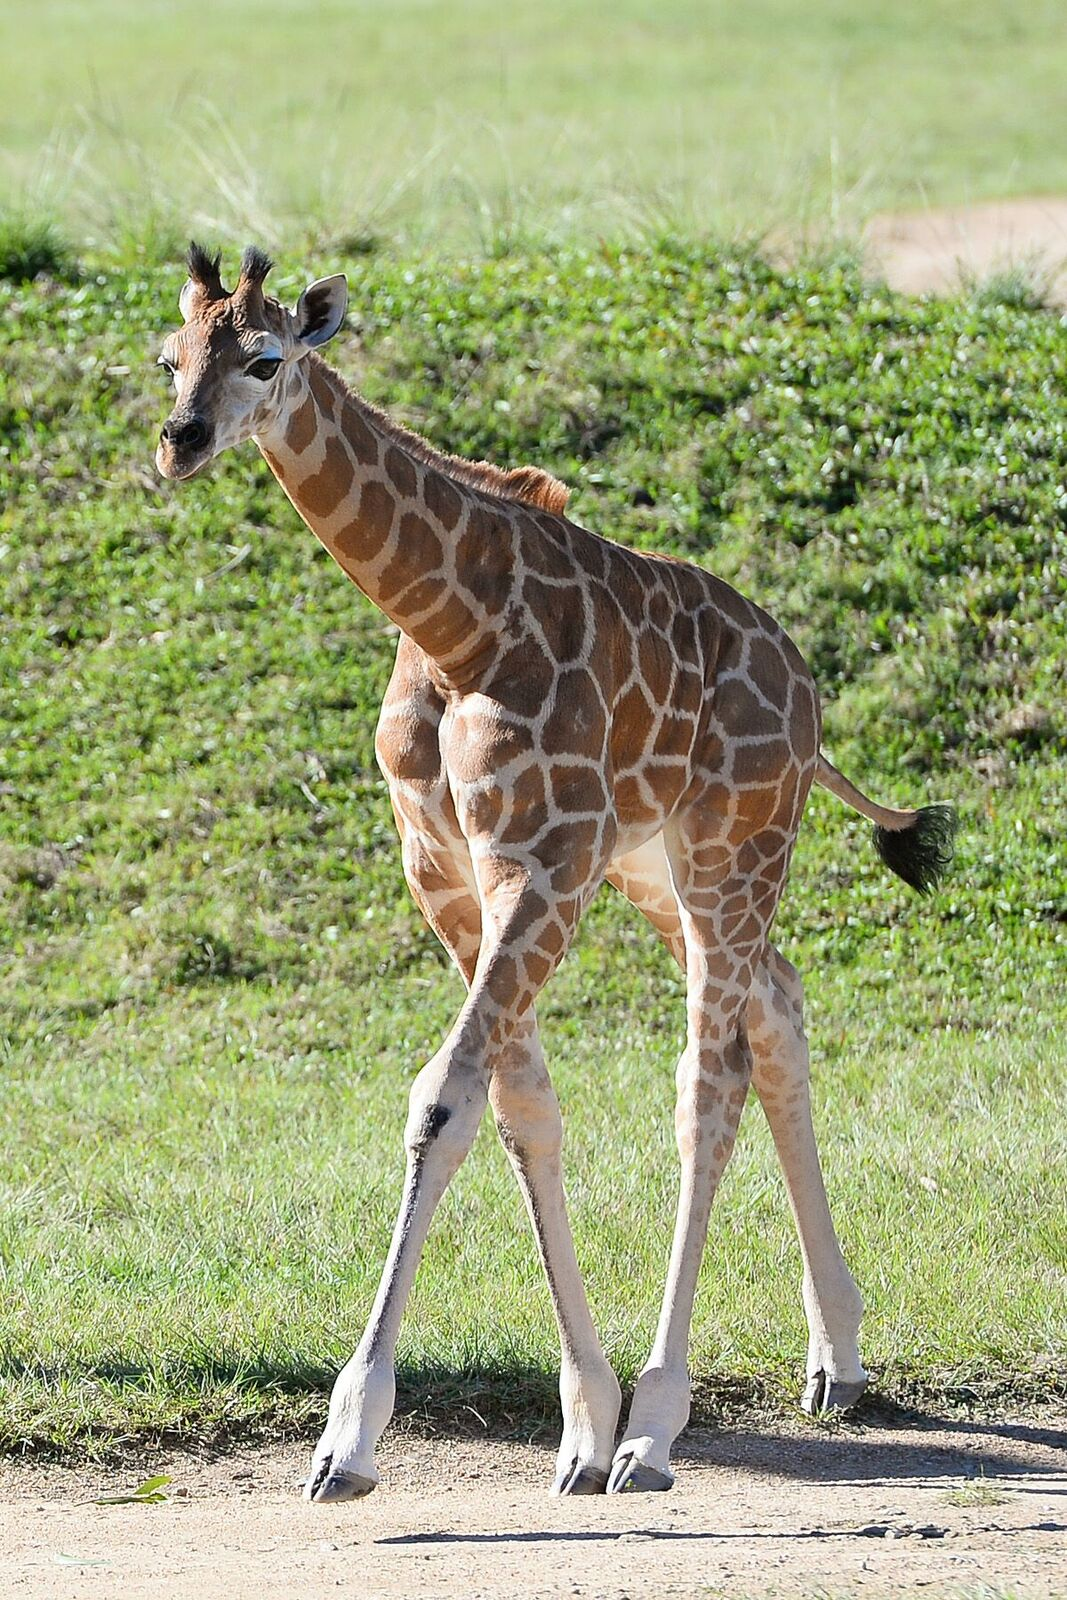 Watch: Giraffe's Epic Journey Across Australia All In The Name Of